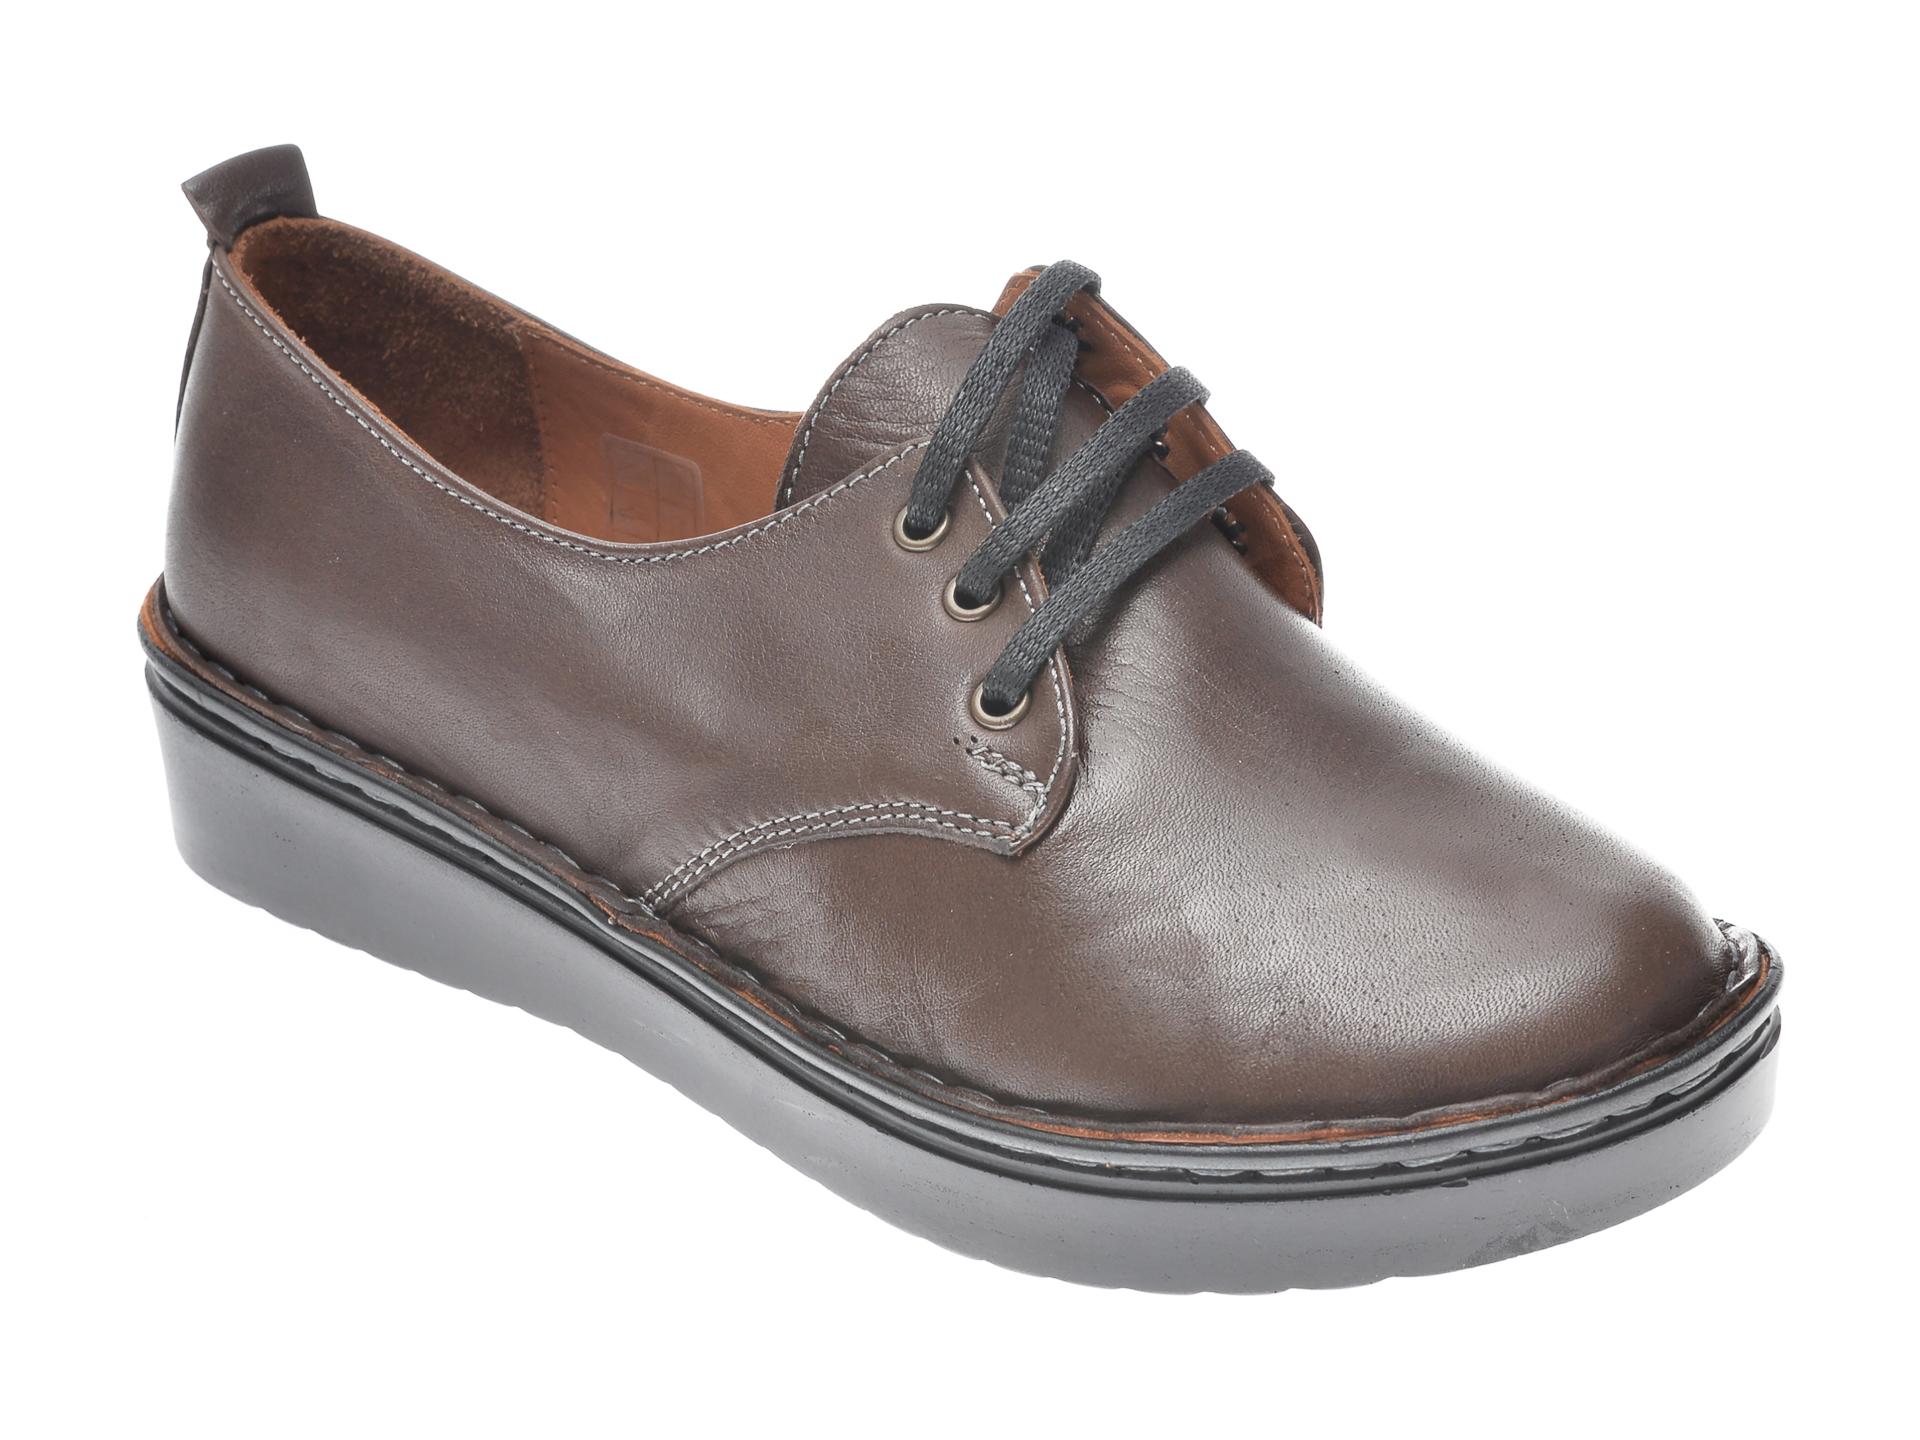 Pantofi Flavia Passini Maro, 953520, Din Piele Naturala